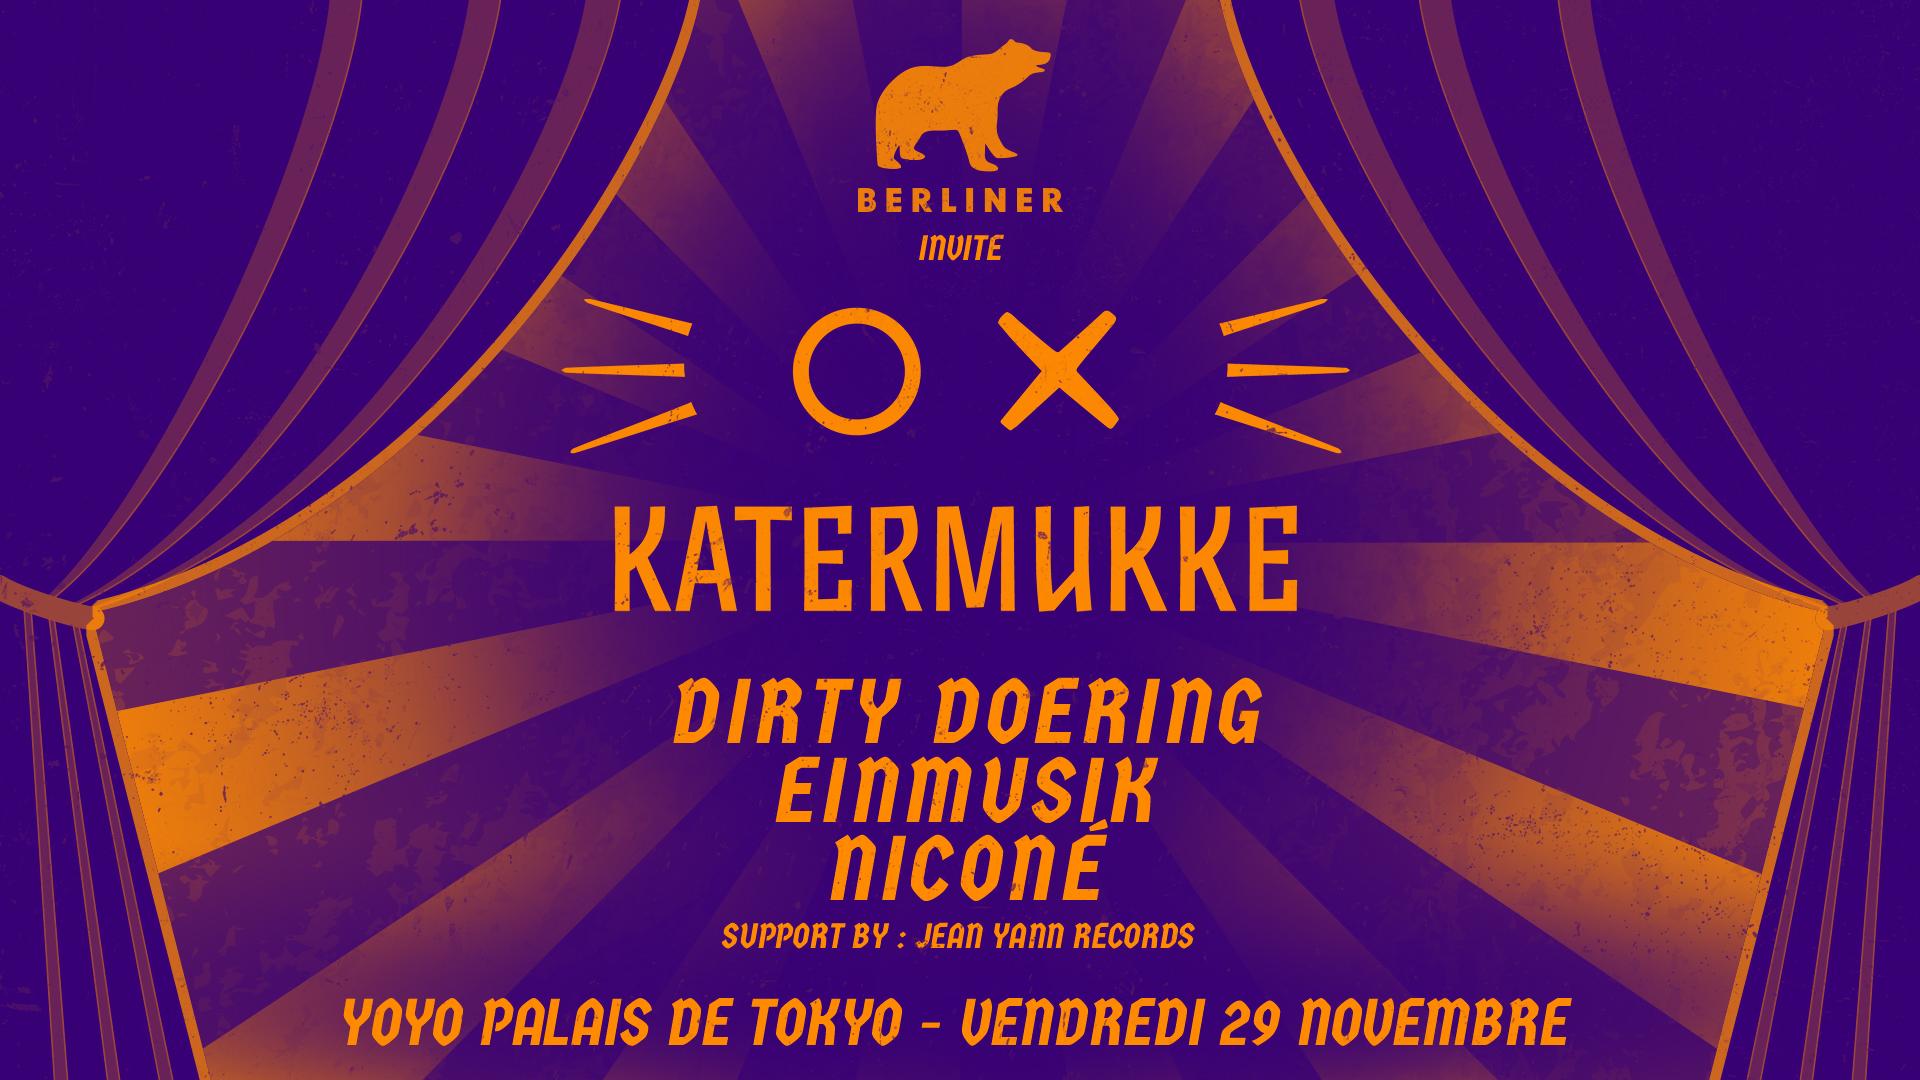 Berliner invite Katermukke w/ Dirty Doering, Einmusik (live), Niconé